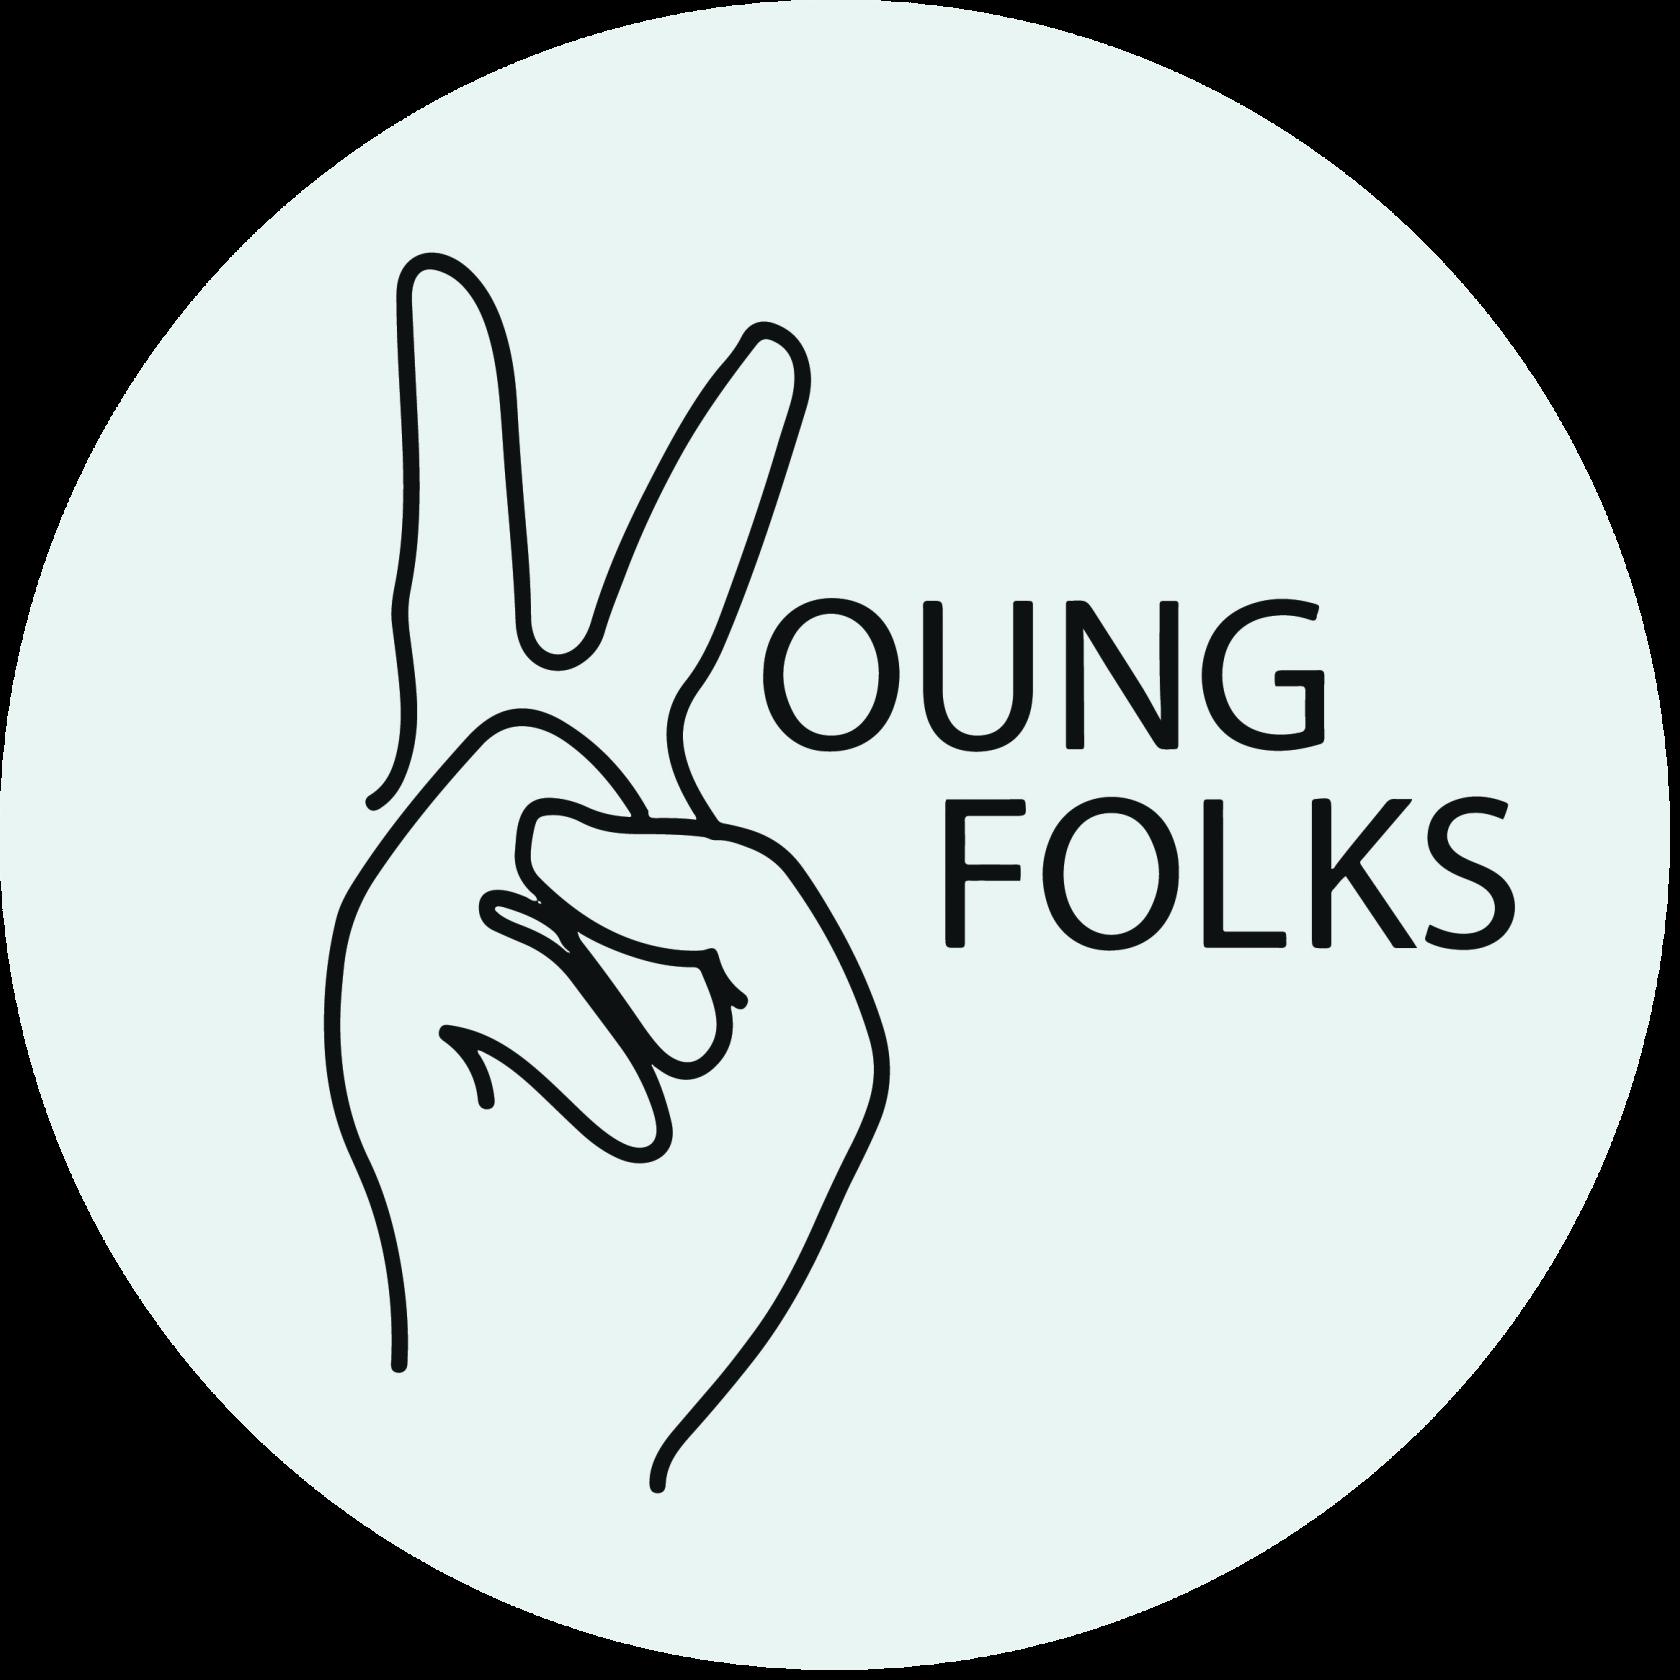 Young Folks Latvia - Partner OrganisationWebsite